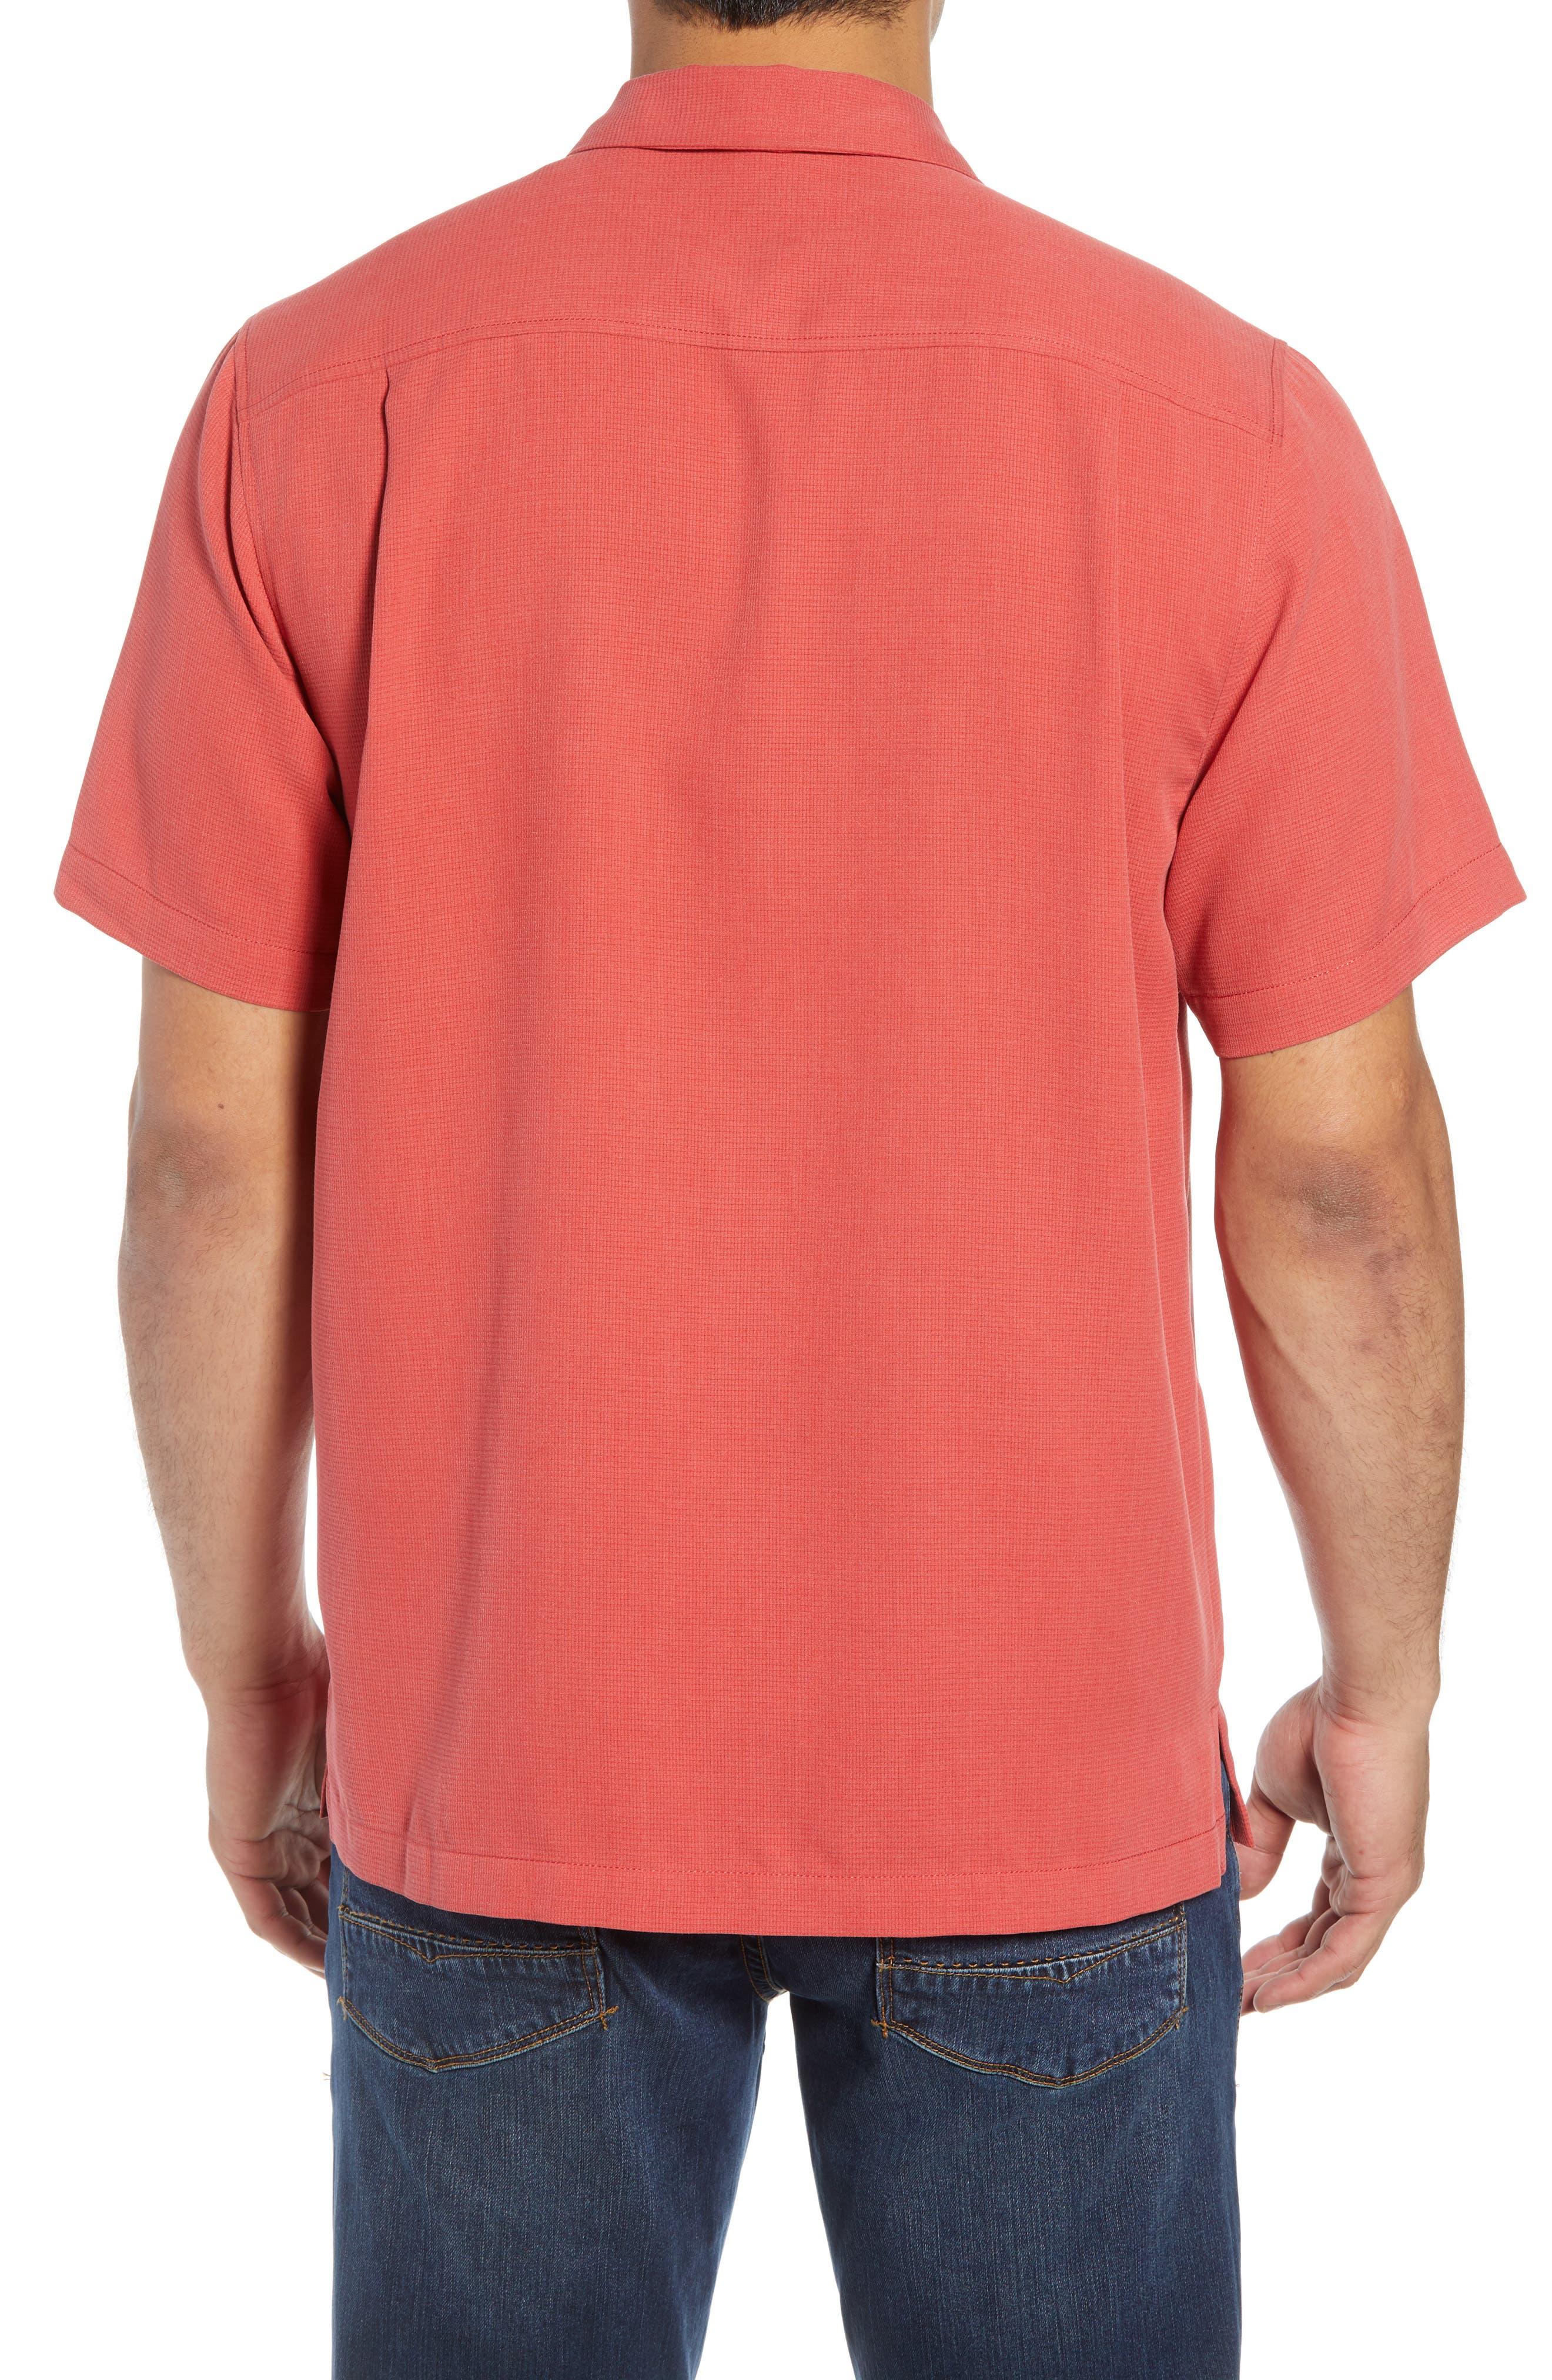 Mens Tommy Bahama Shirts Nordstrom D Island Casual Wrinkle Vintage